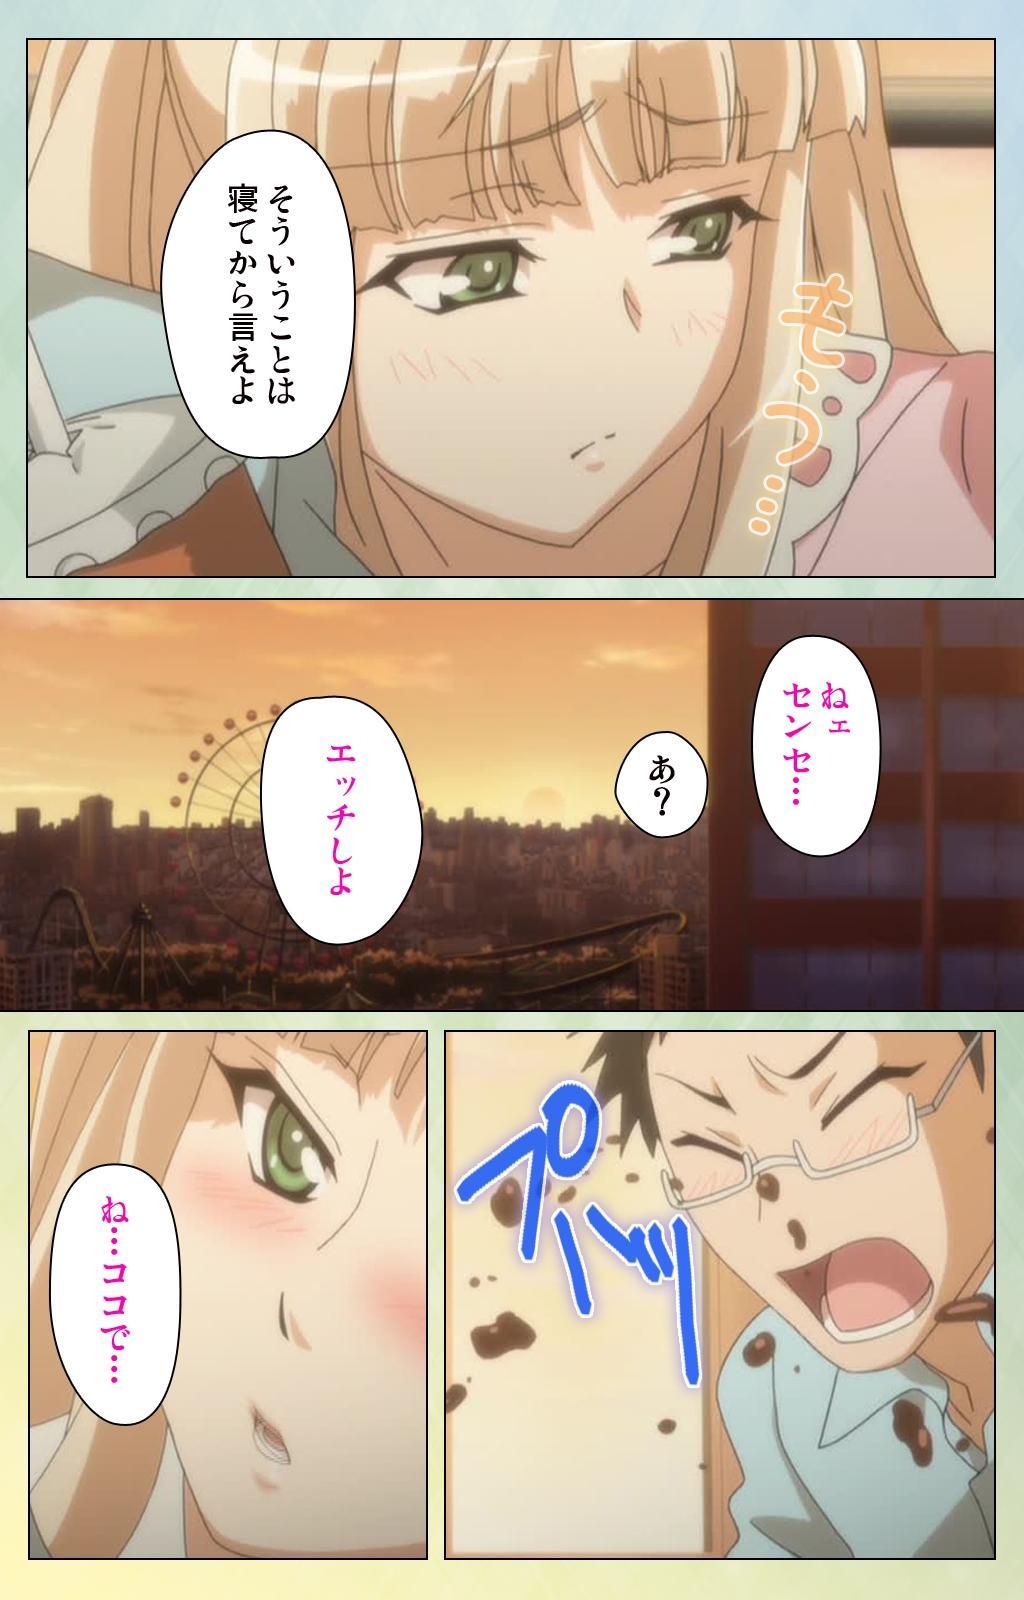 Furueru Kuchibiru fuzzy lips1 Complete Ban 55